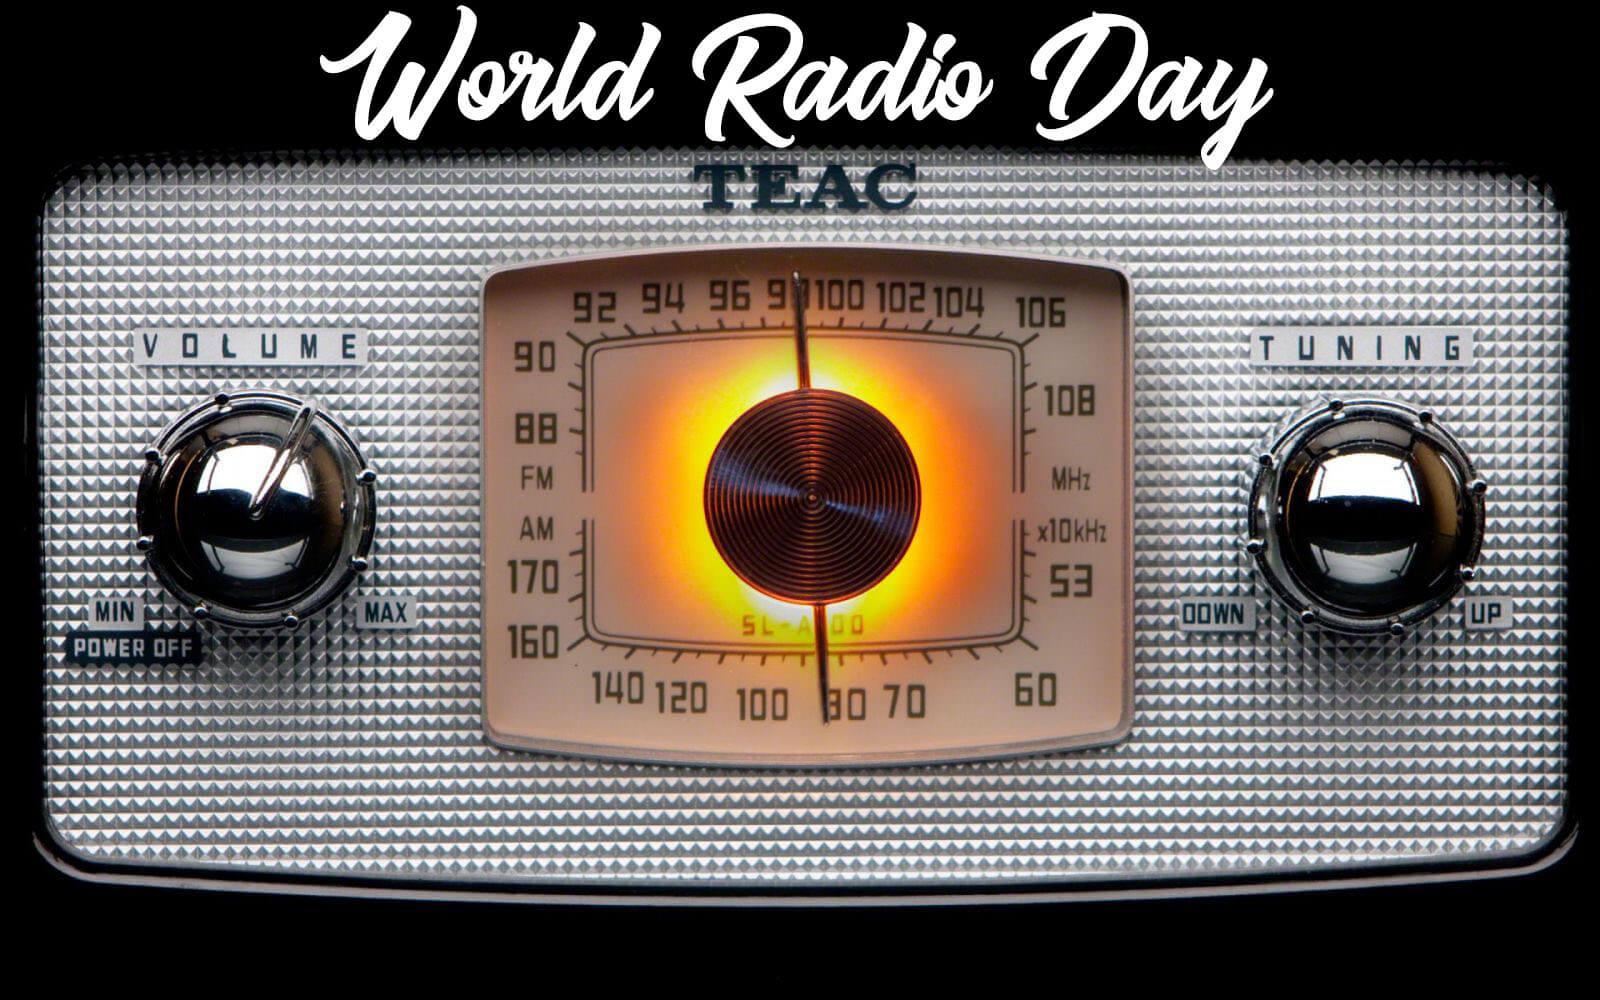 world radio day latest desktop background pc hd wallpaper